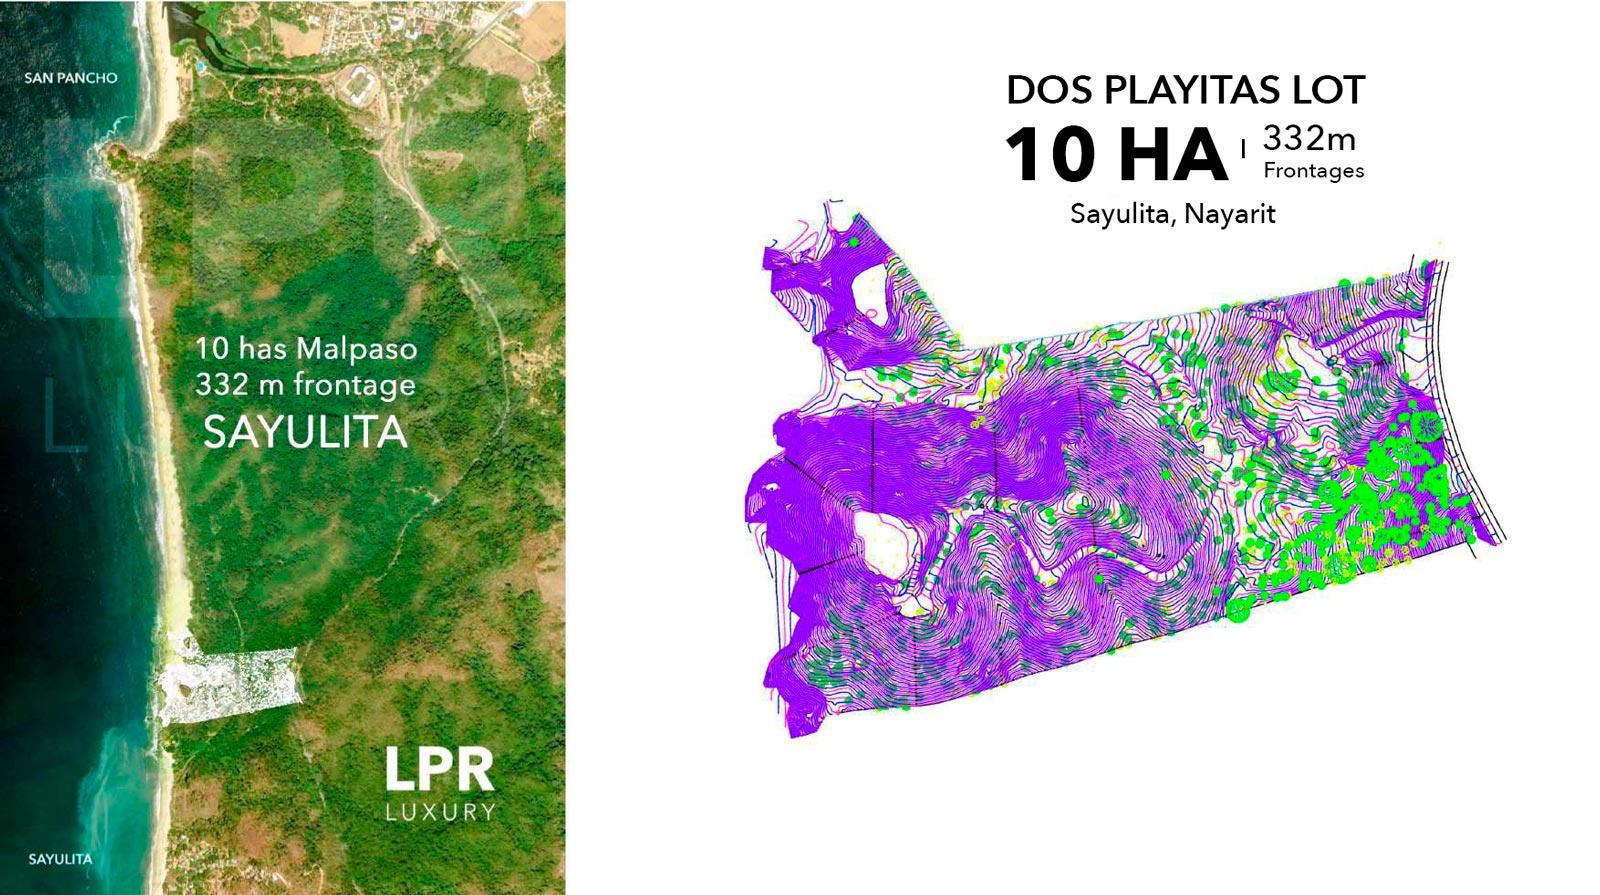 Dos Playitas - Malpaso - Sayulita Nayarit, Mexico development land for sale - Luxury beachfront resort real estate